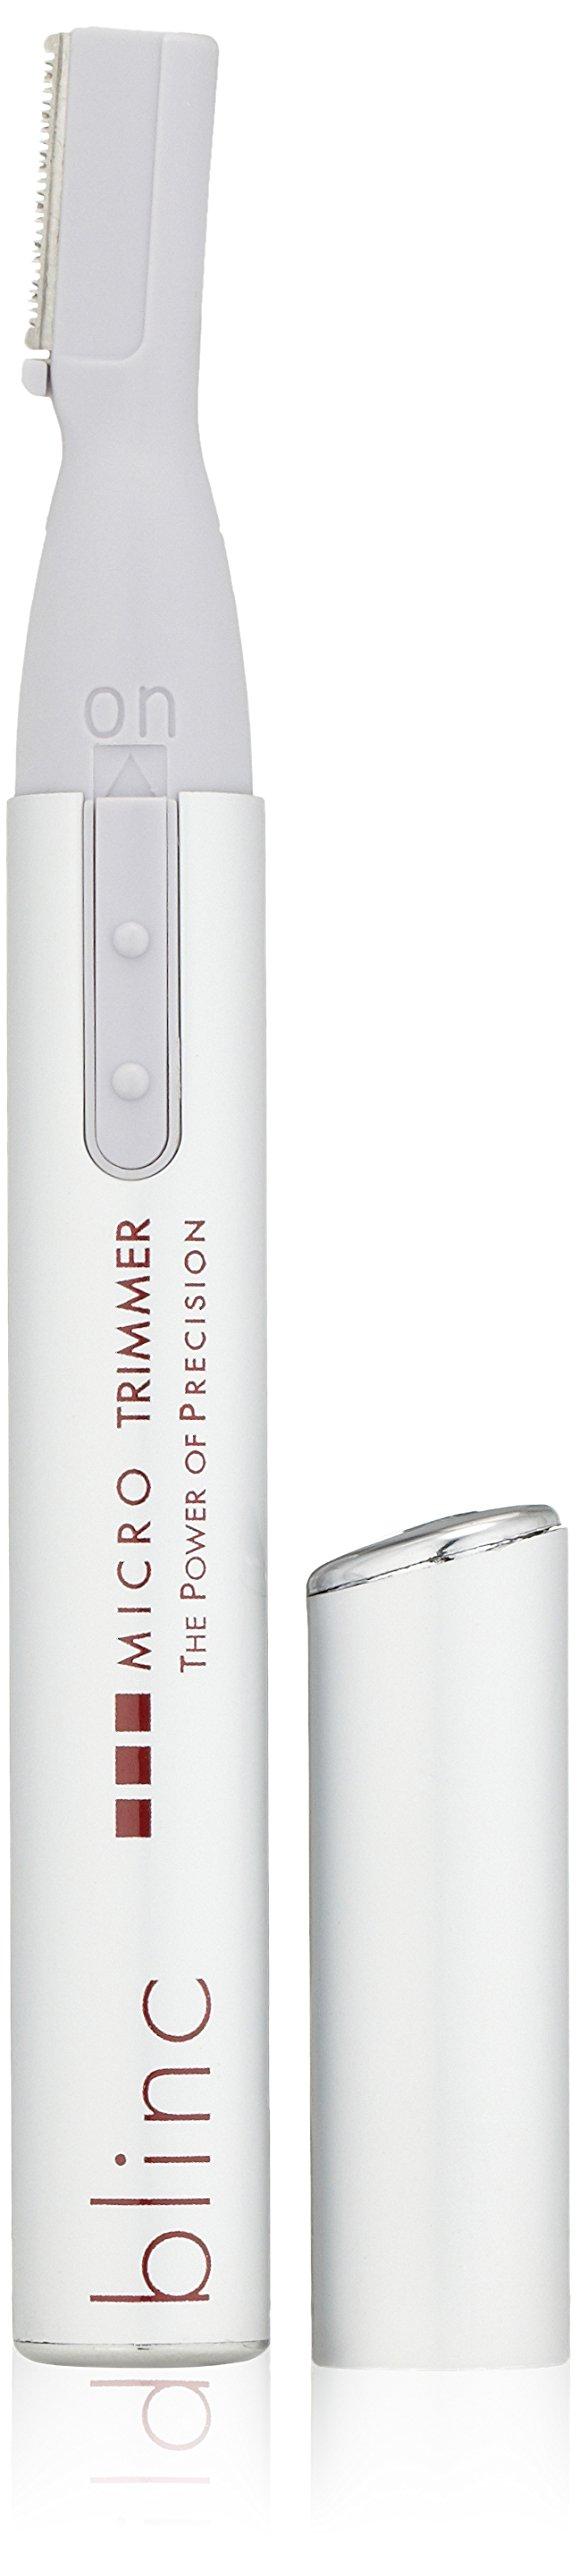 blinc Micro Trimmer